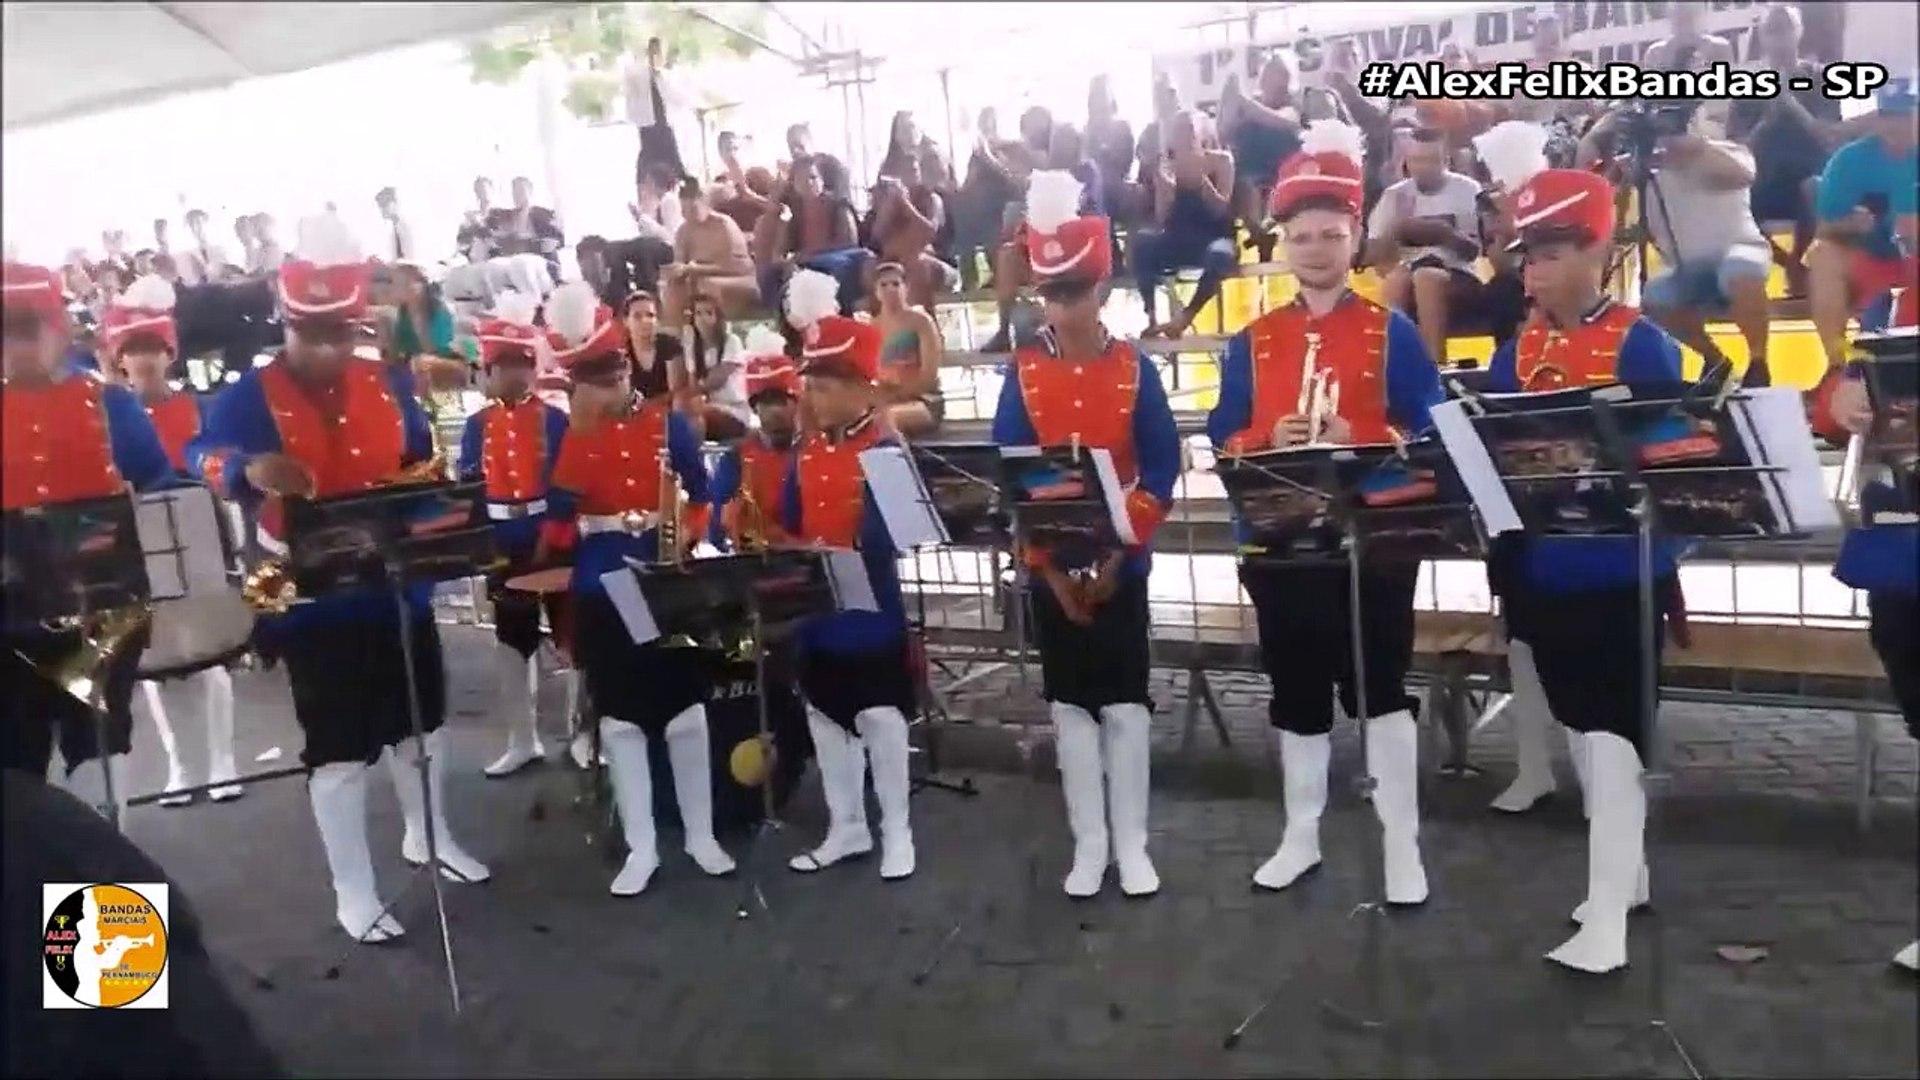 Banda Marcial Padre Jose de Anchieta - 1° Festival de Bandas - Cubatão 2018 - #AlexFelixBandasSP